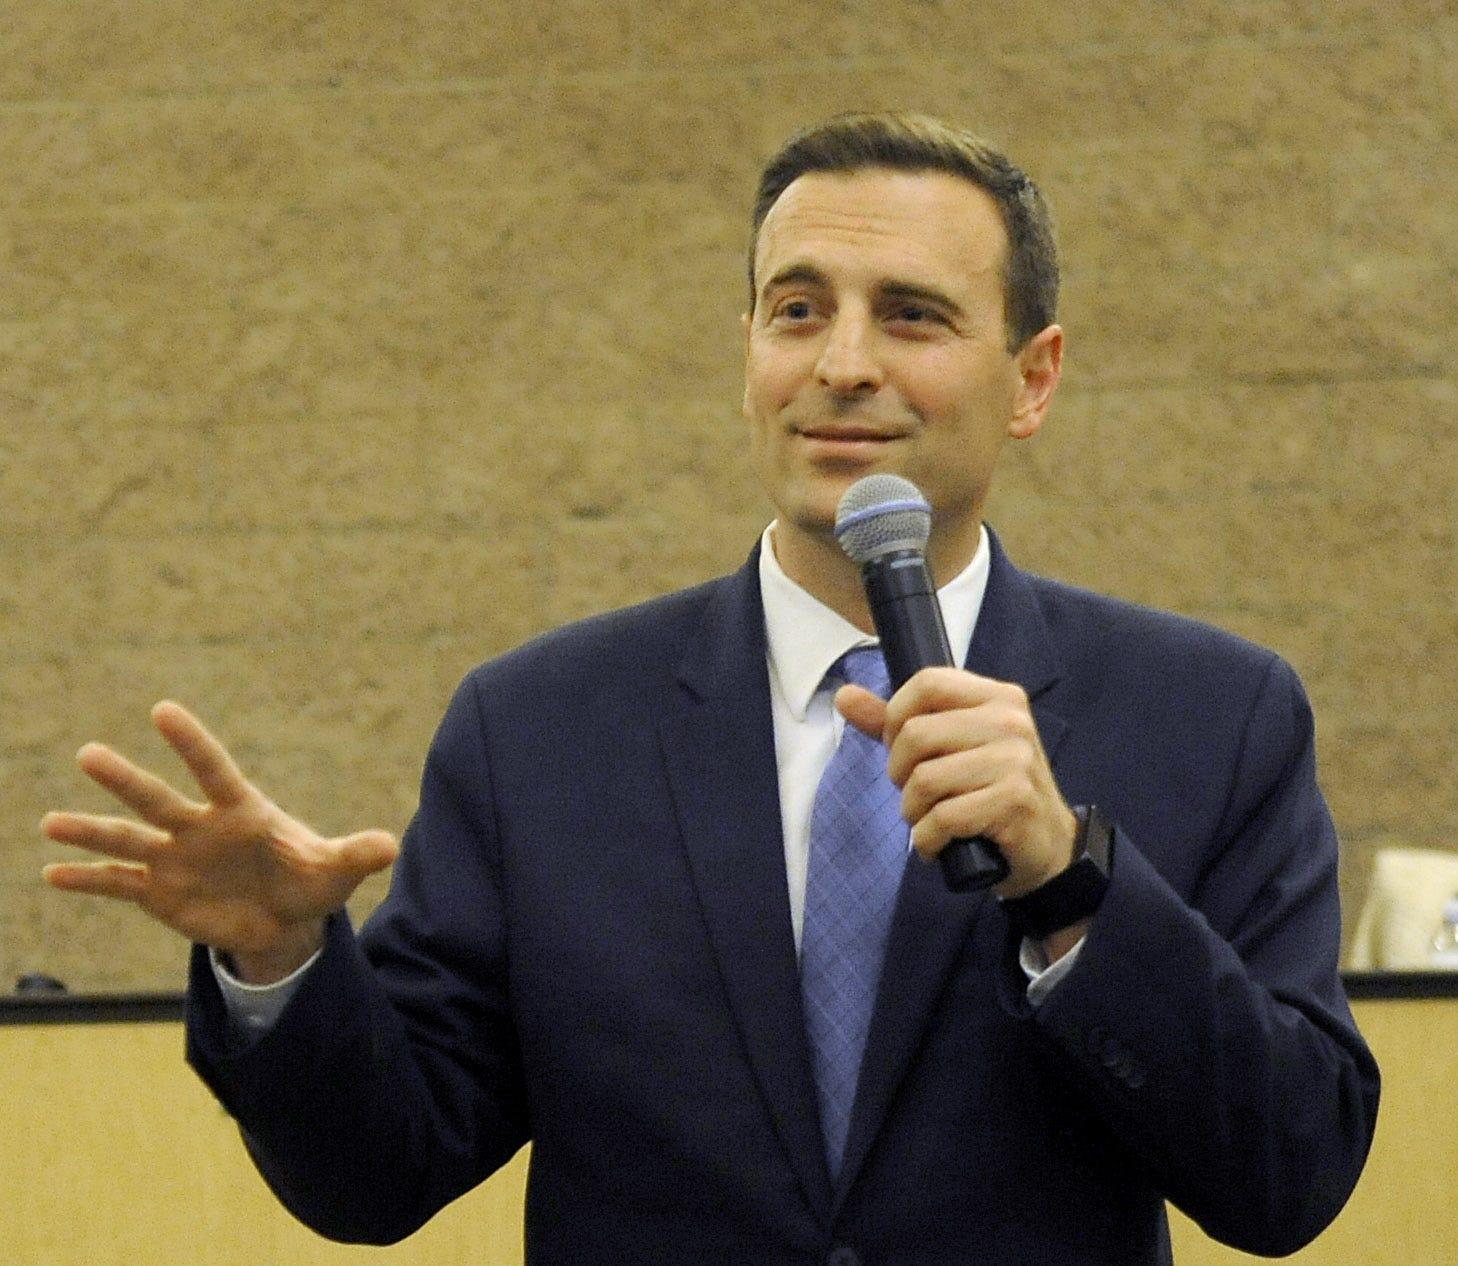 Meet Republican Adam Laxalt, perhaps Nevada's best- and worst-known governor candidate | Reno Gazette Journal